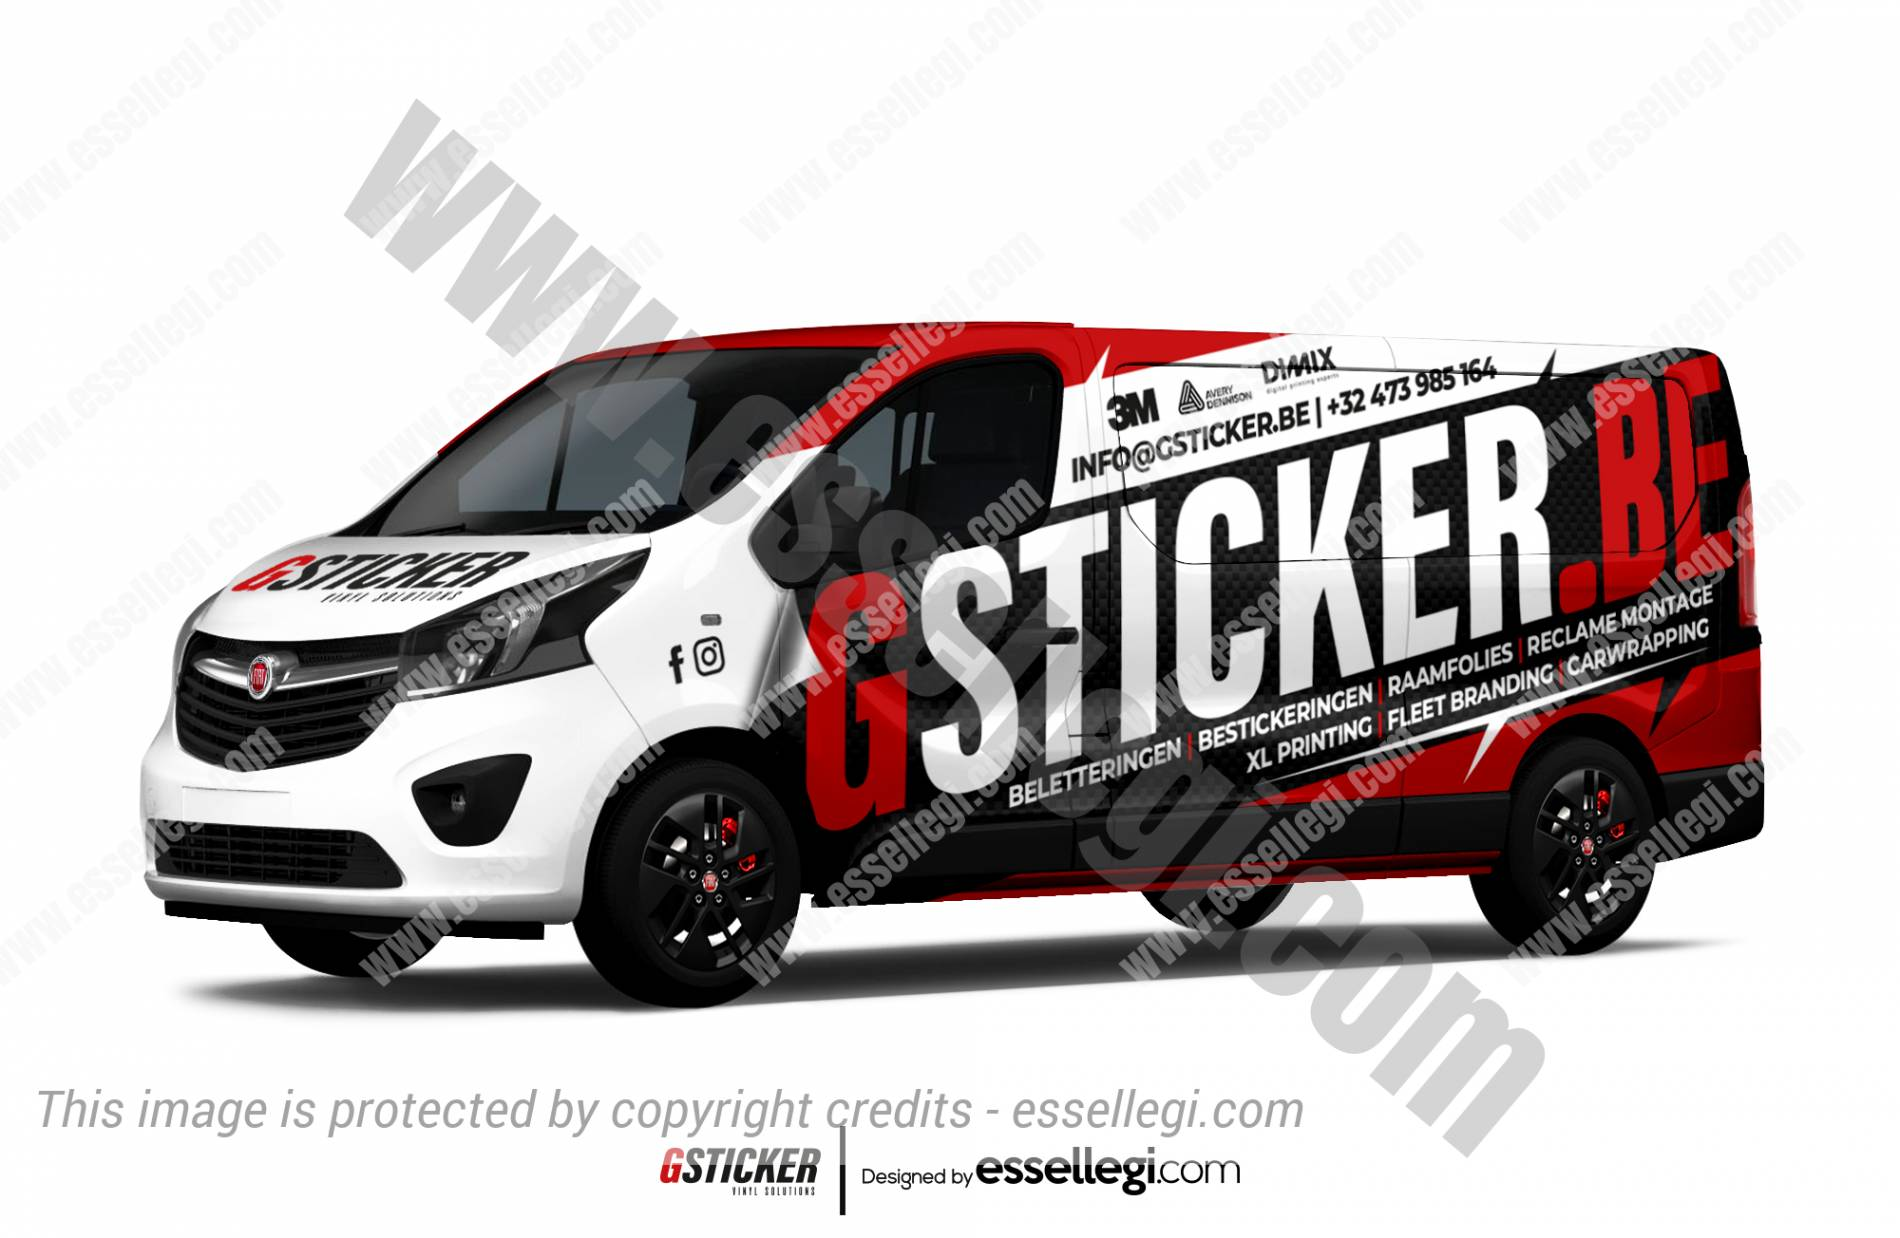 Fiat Talento Wrap Design. Fiat Talento | Van Wrap Design by Essellegi. Van Signs, Van Signage, Van Wrapping, Van Signwriting, Van Wrap Designer, Signs for Van, Van Logo, Van Graphic by Essellegi.